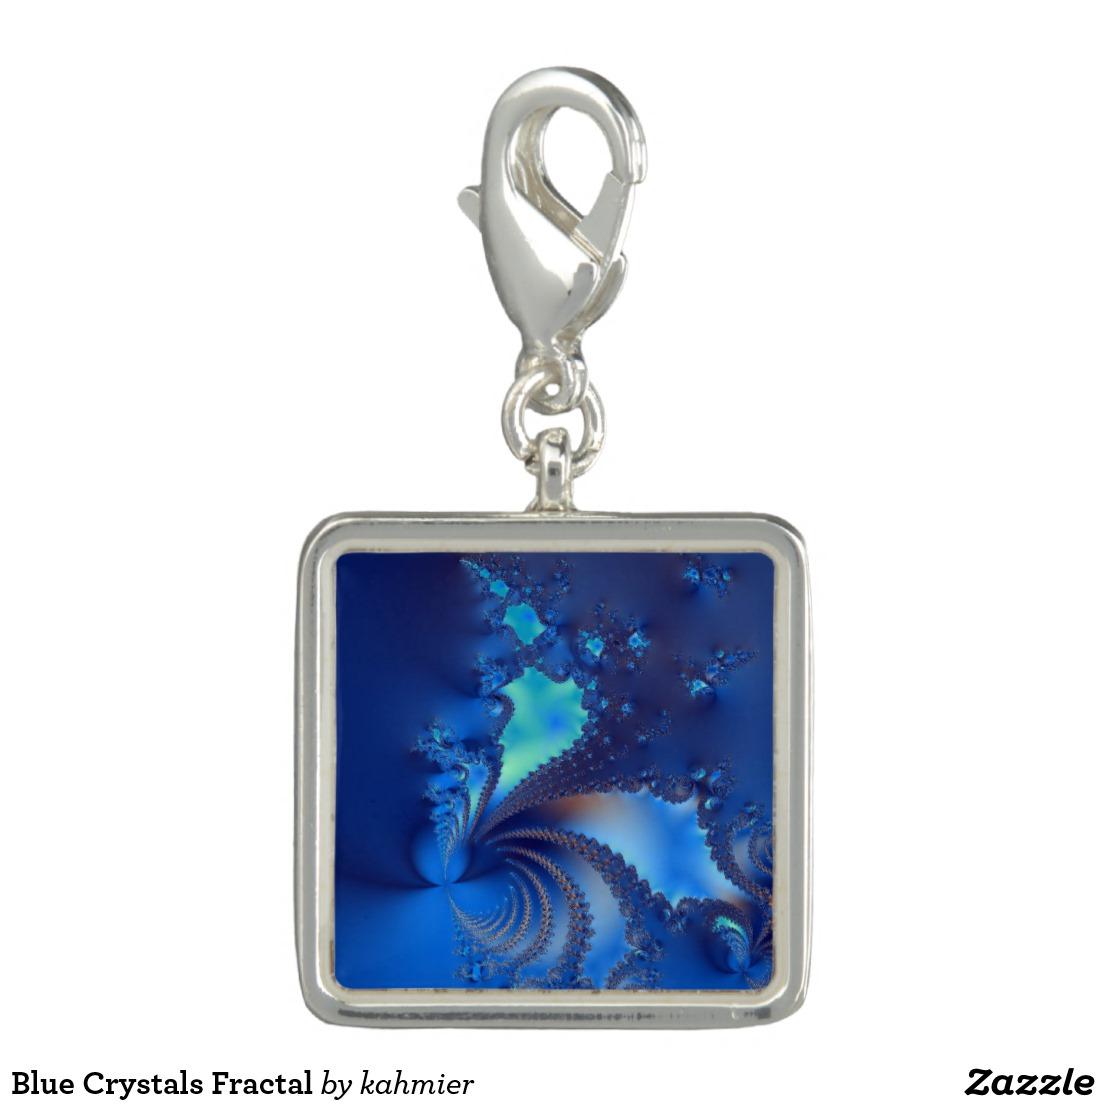 Blue Crystals Fractal Charm